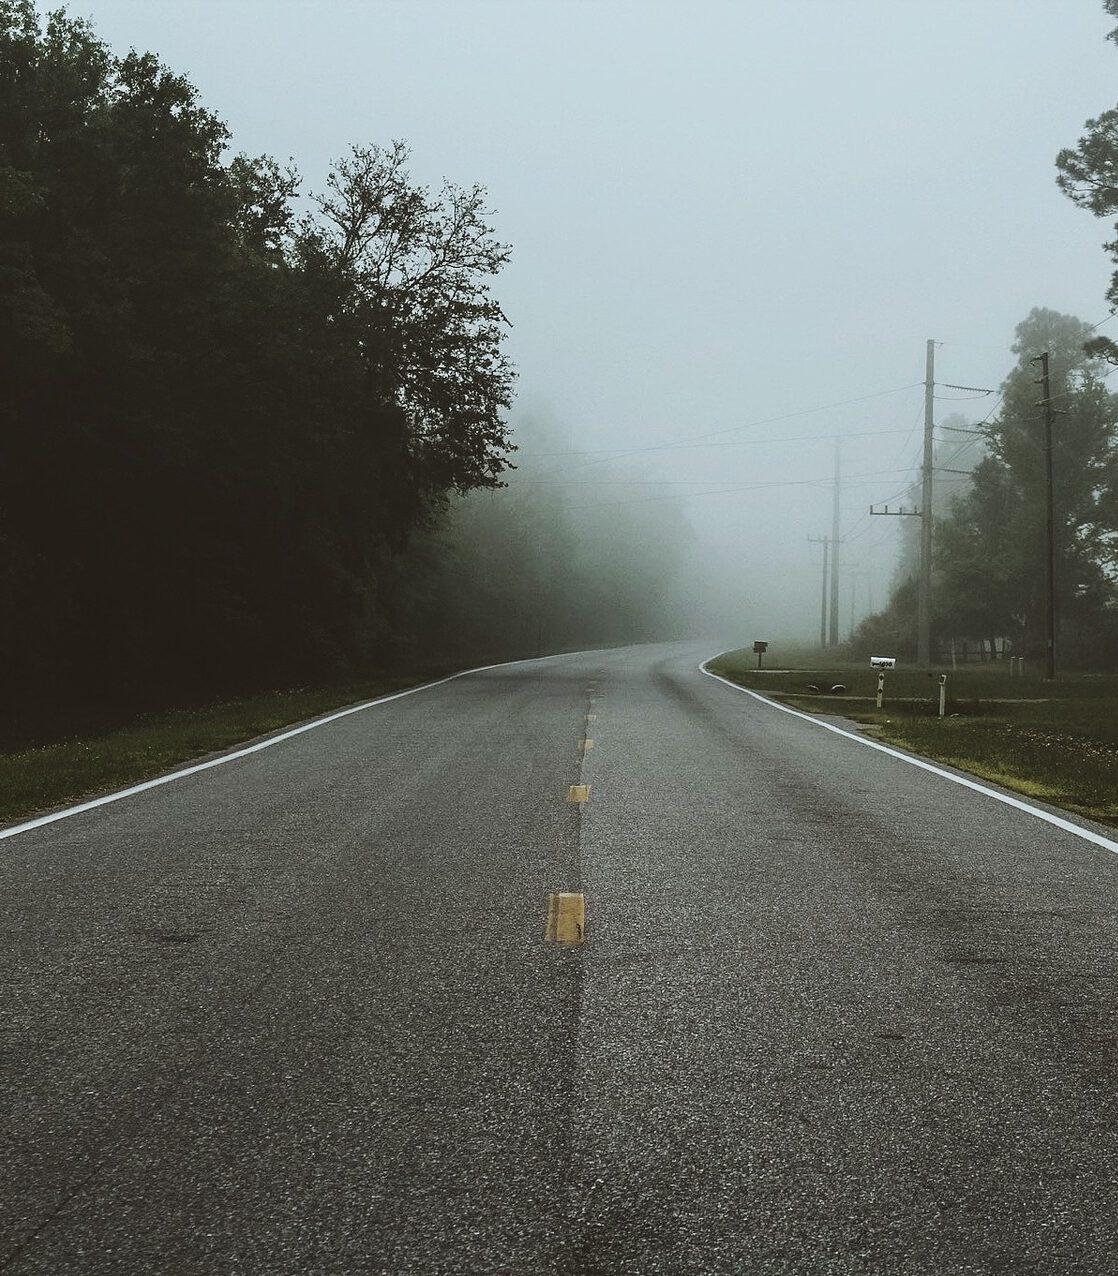 road-863661_1920